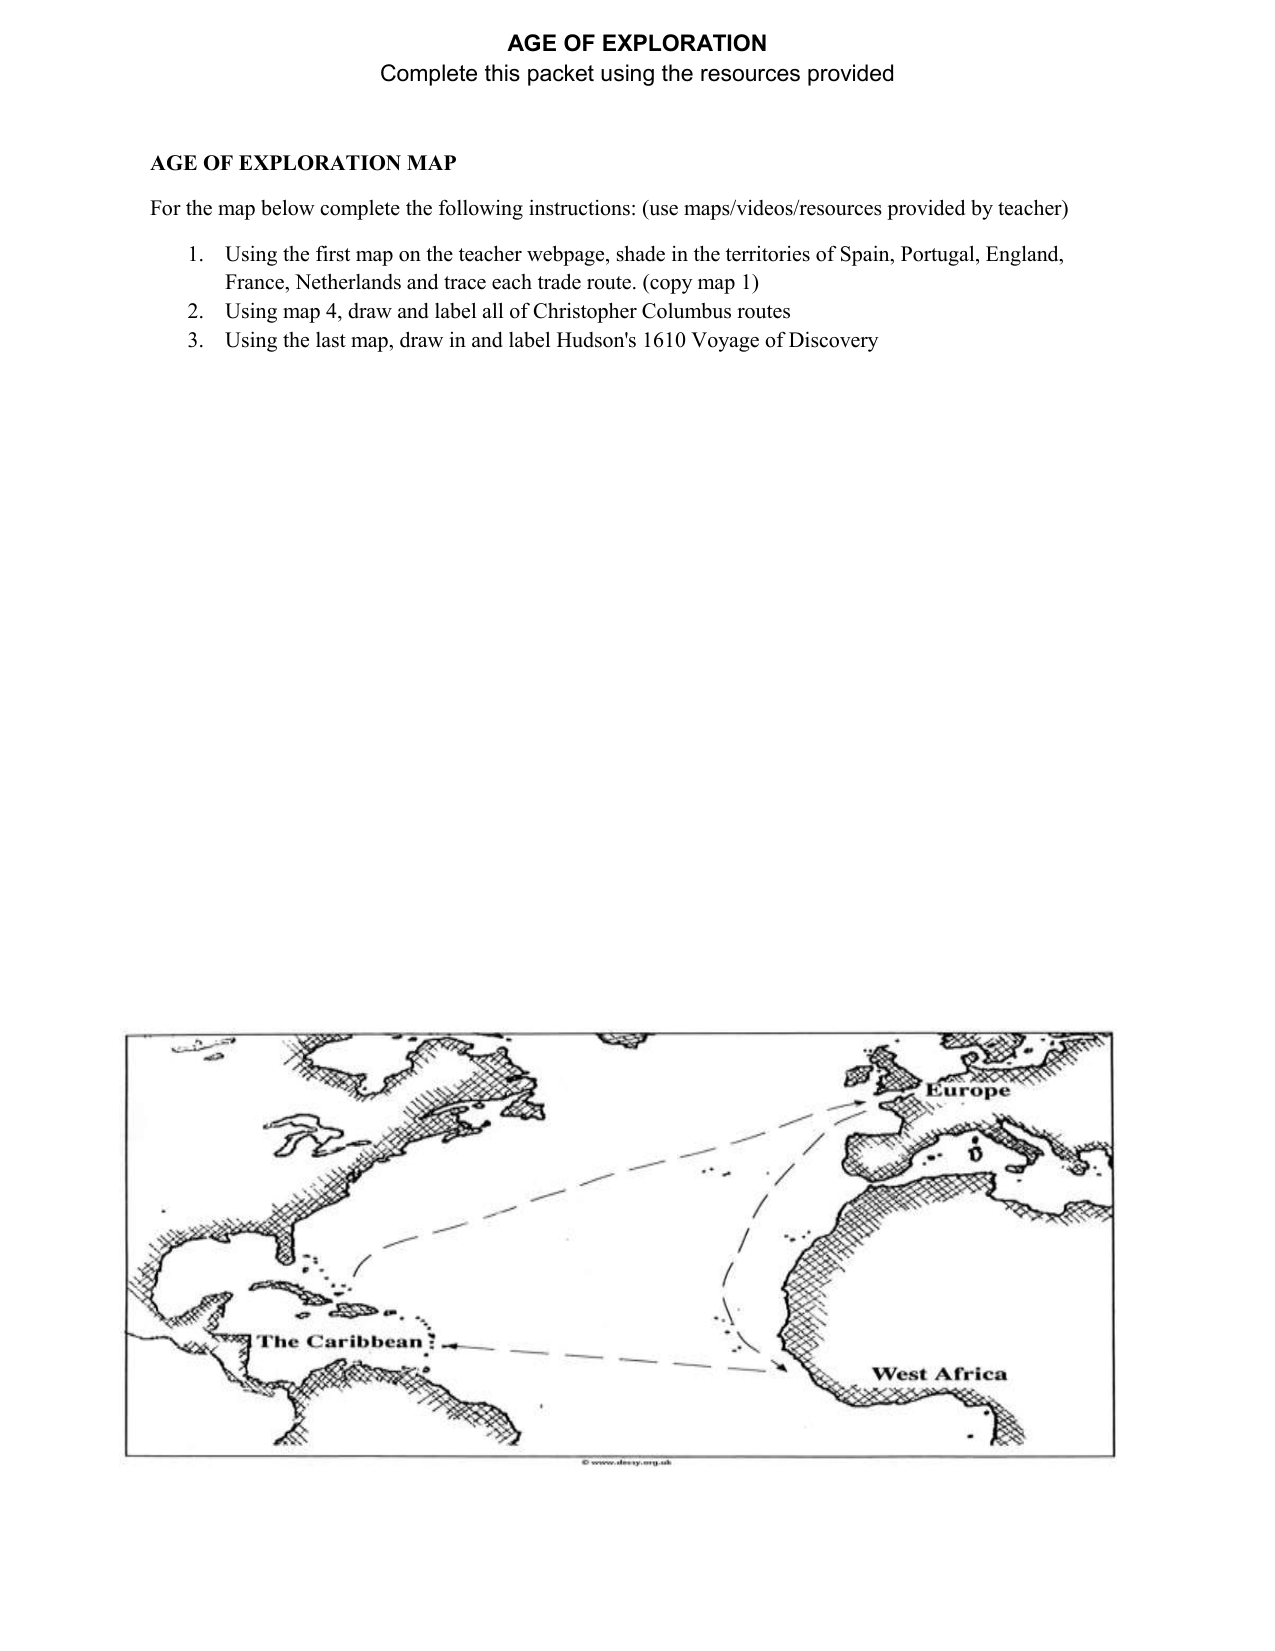 Columbian Exchange Map Drawing